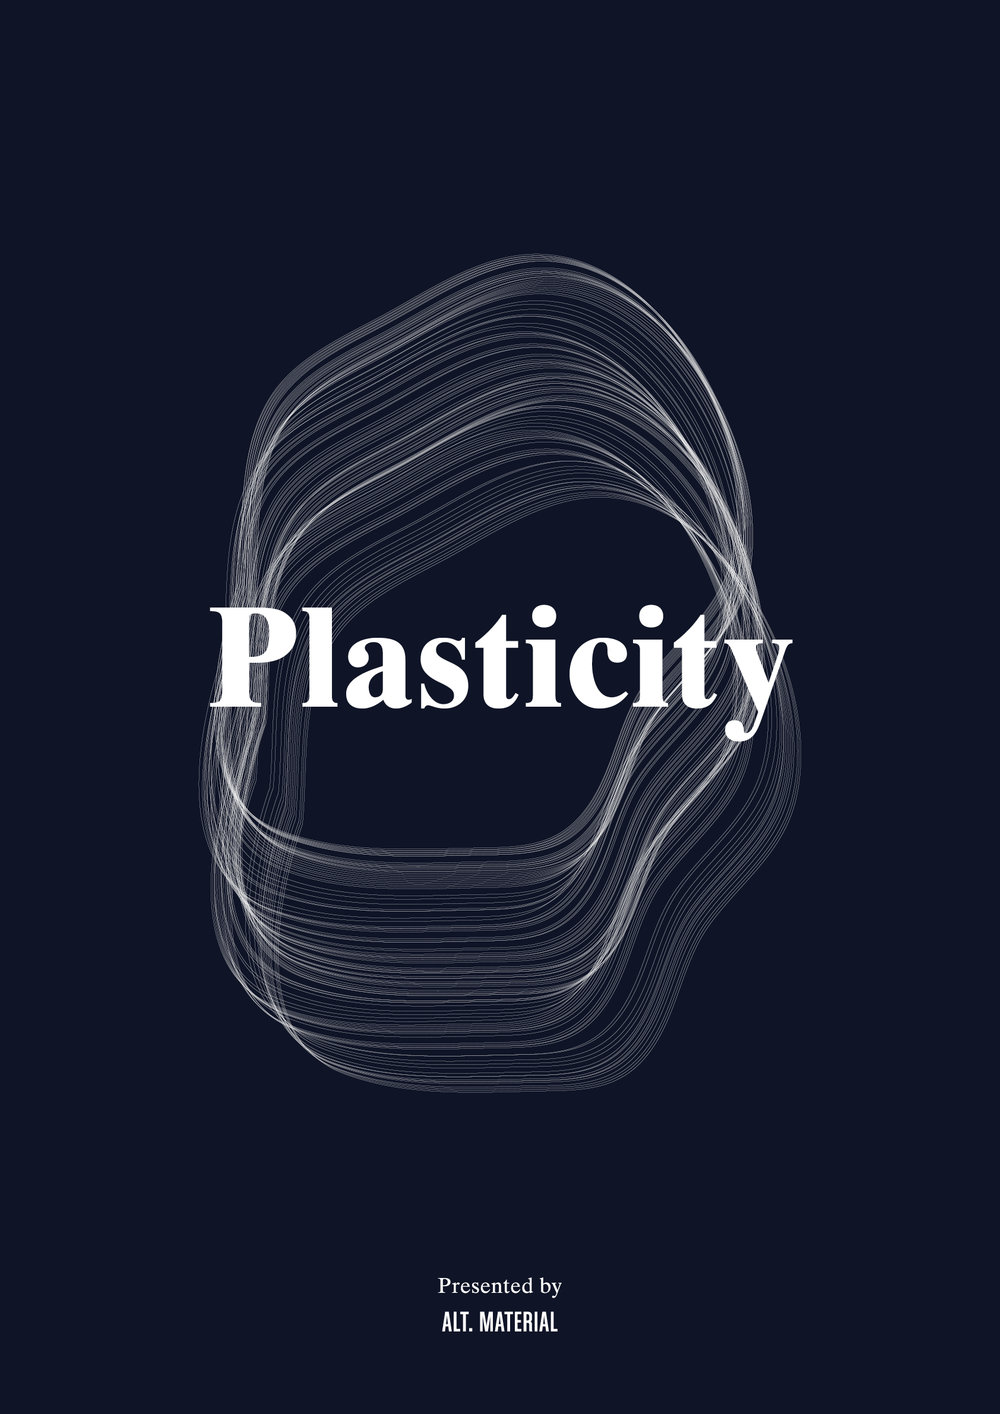 PLASTICITY_POSTER.jpg